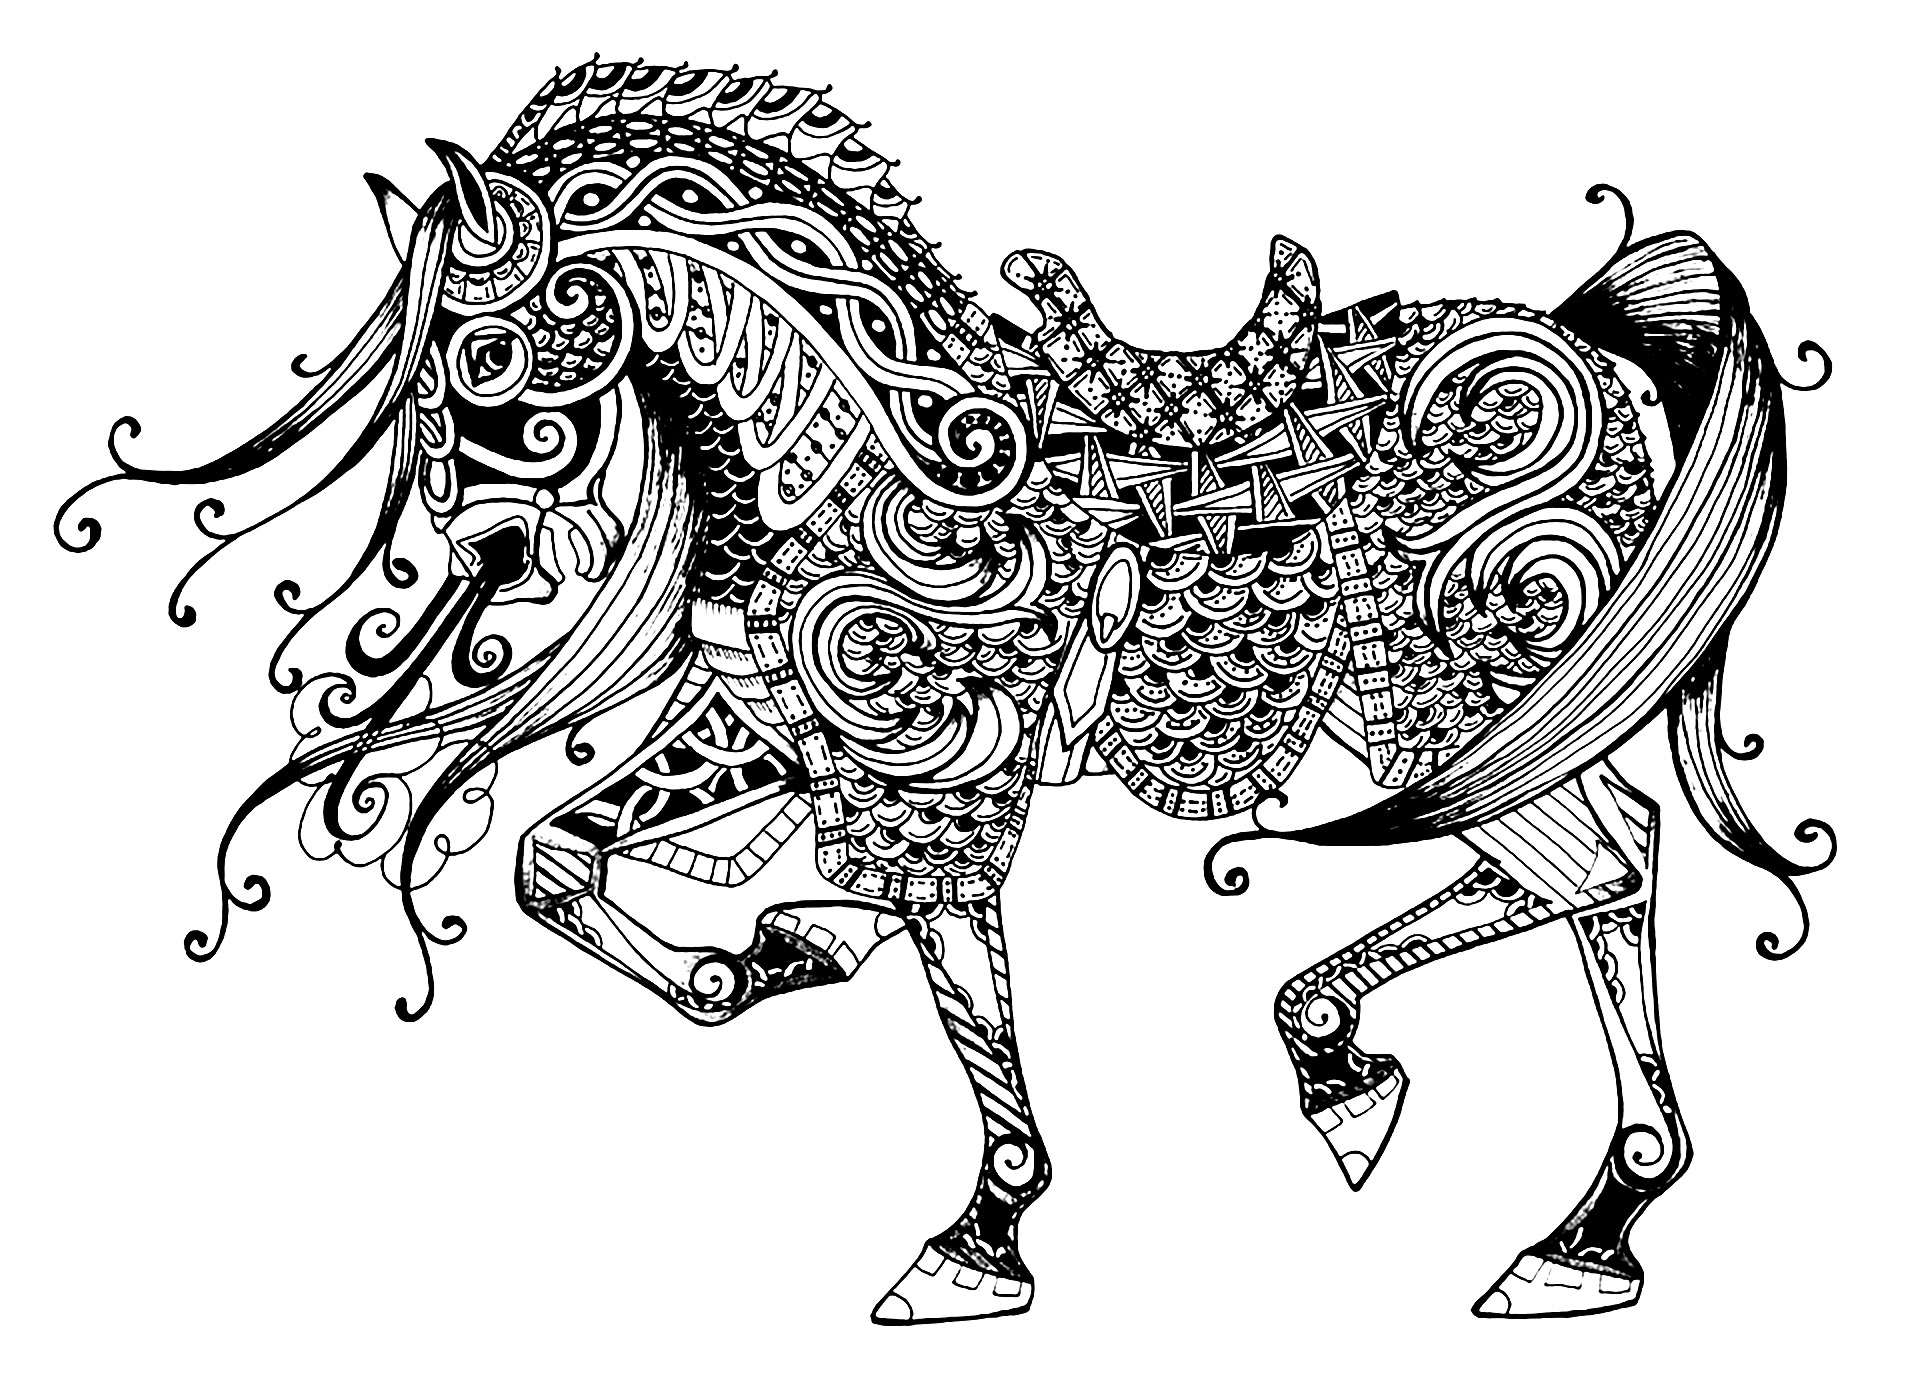 Pferde 46216 - Pferde - Malbuch Fur Erwachsene